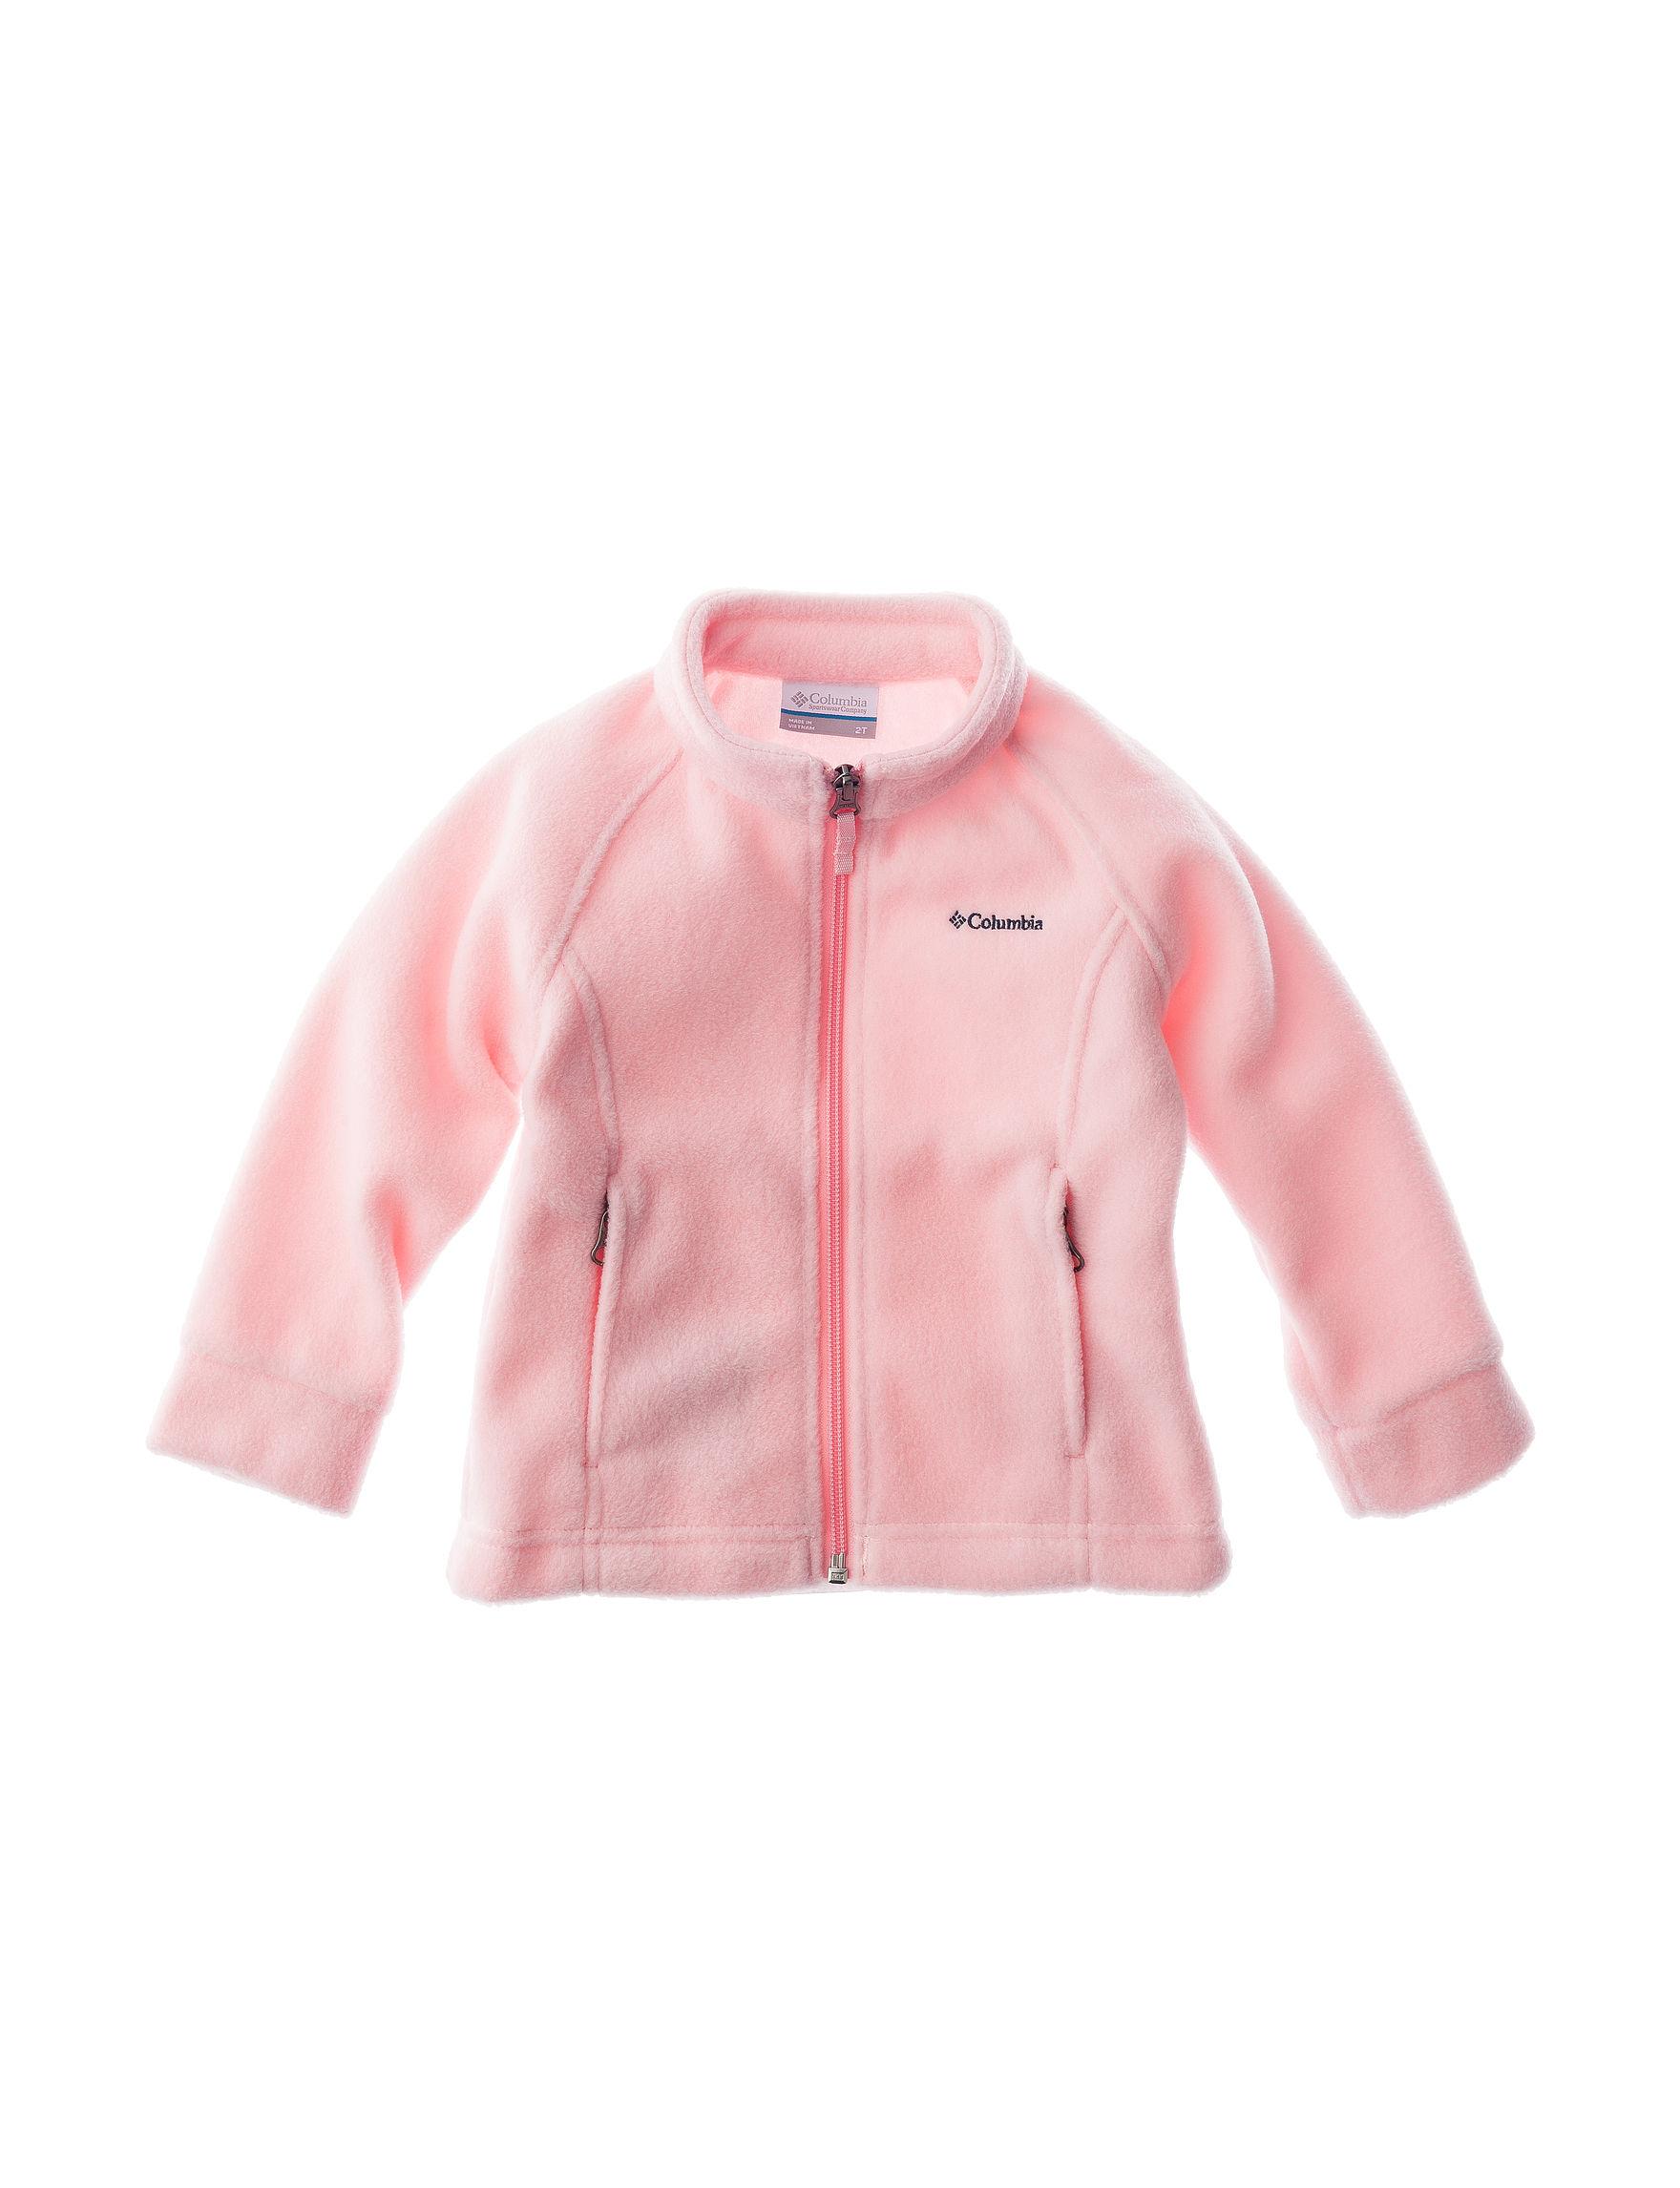 Columbia Pink